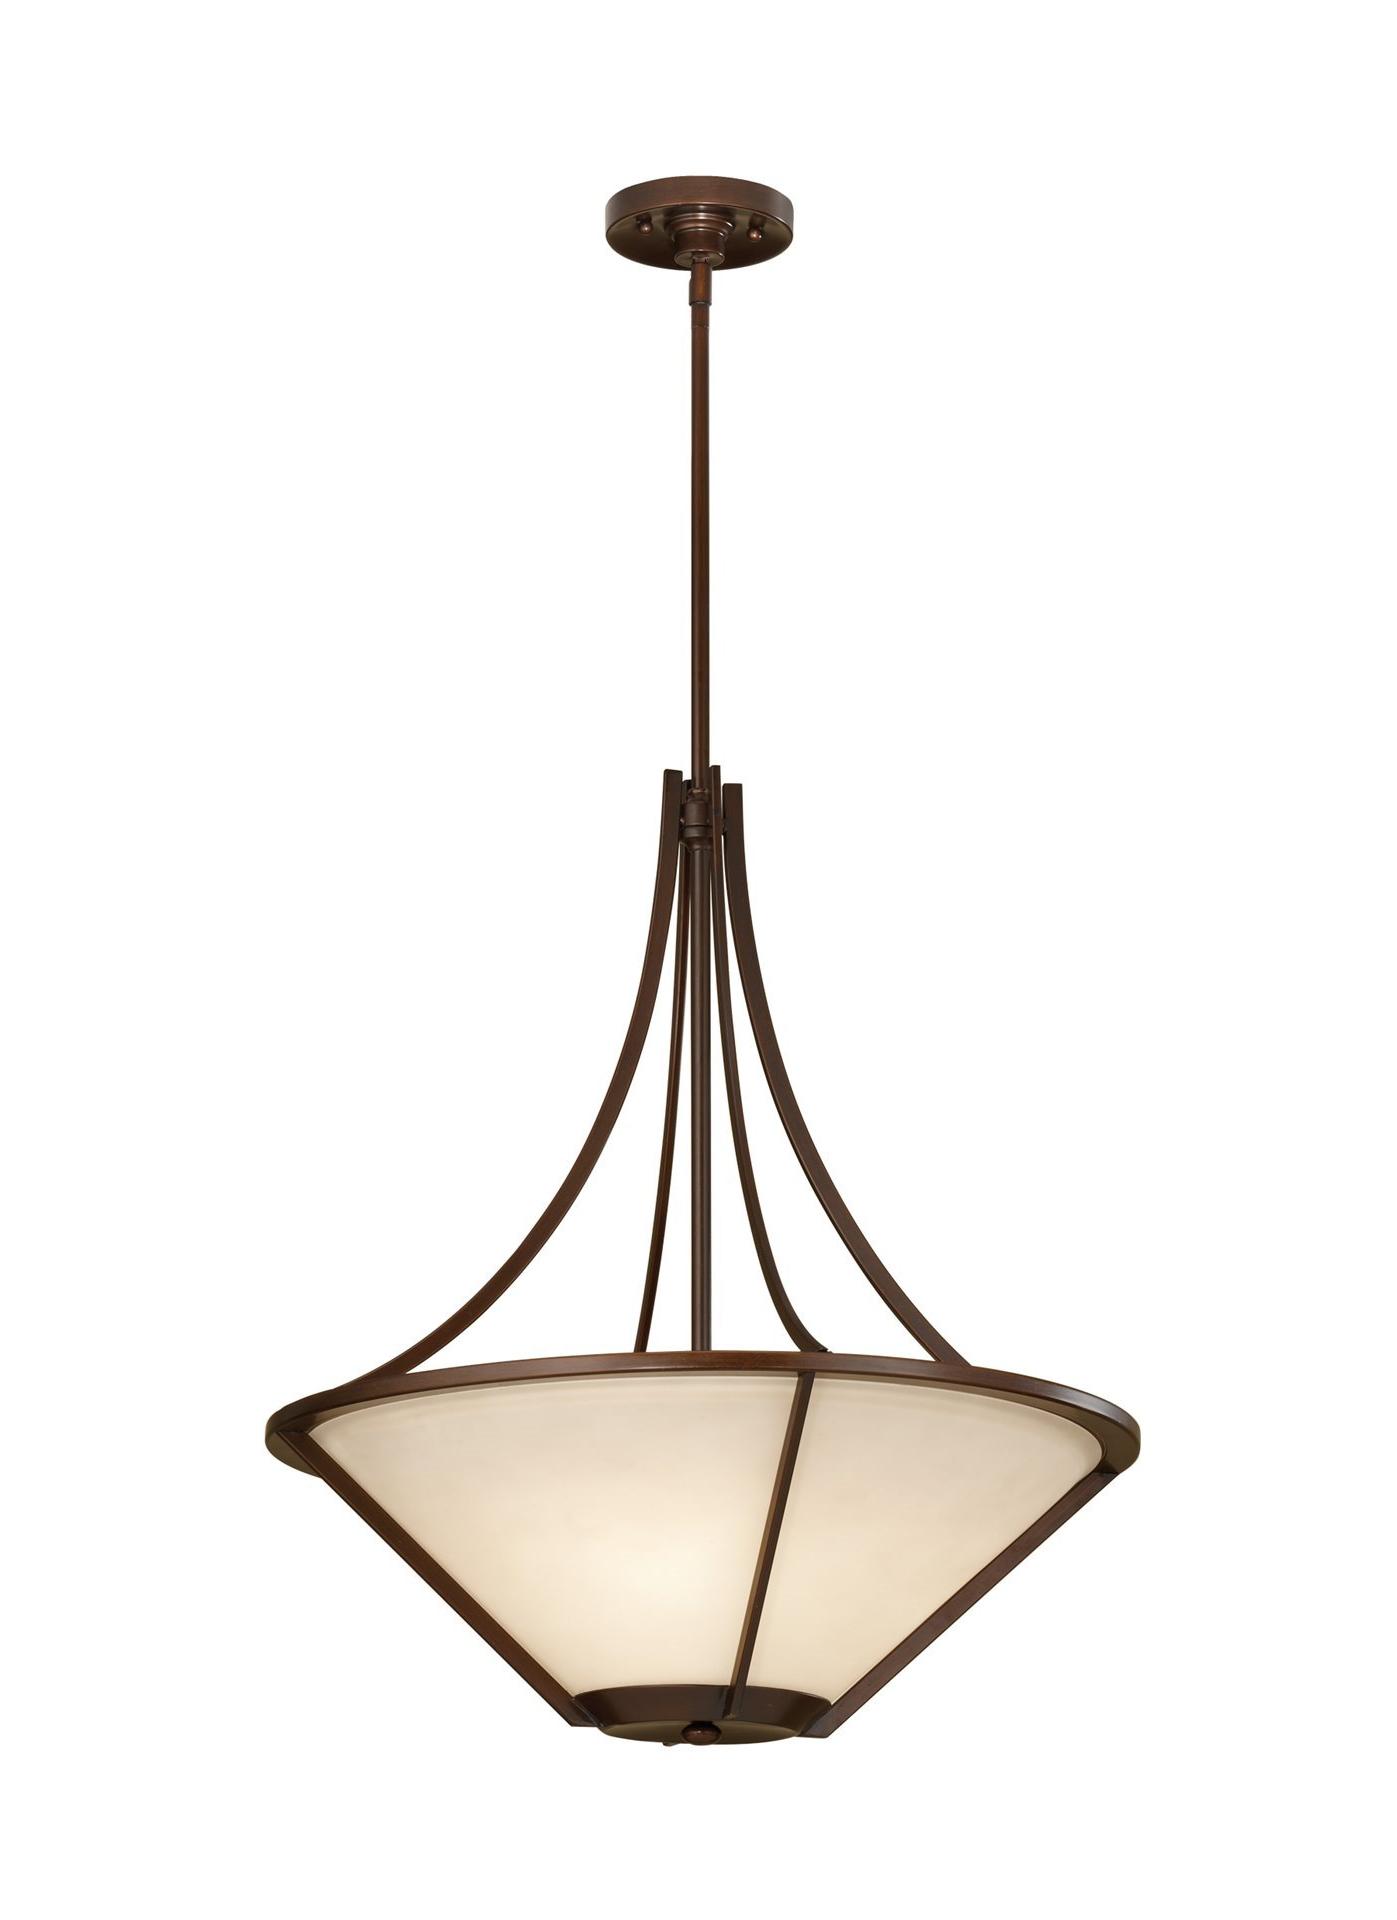 "Nolan 1 Light Lantern Chandeliers Within Fashionable 100W Nolan 21"" Heritage Bronze Cream Etched A 19 3 Light Uplight Chandelier (View 16 of 20)"